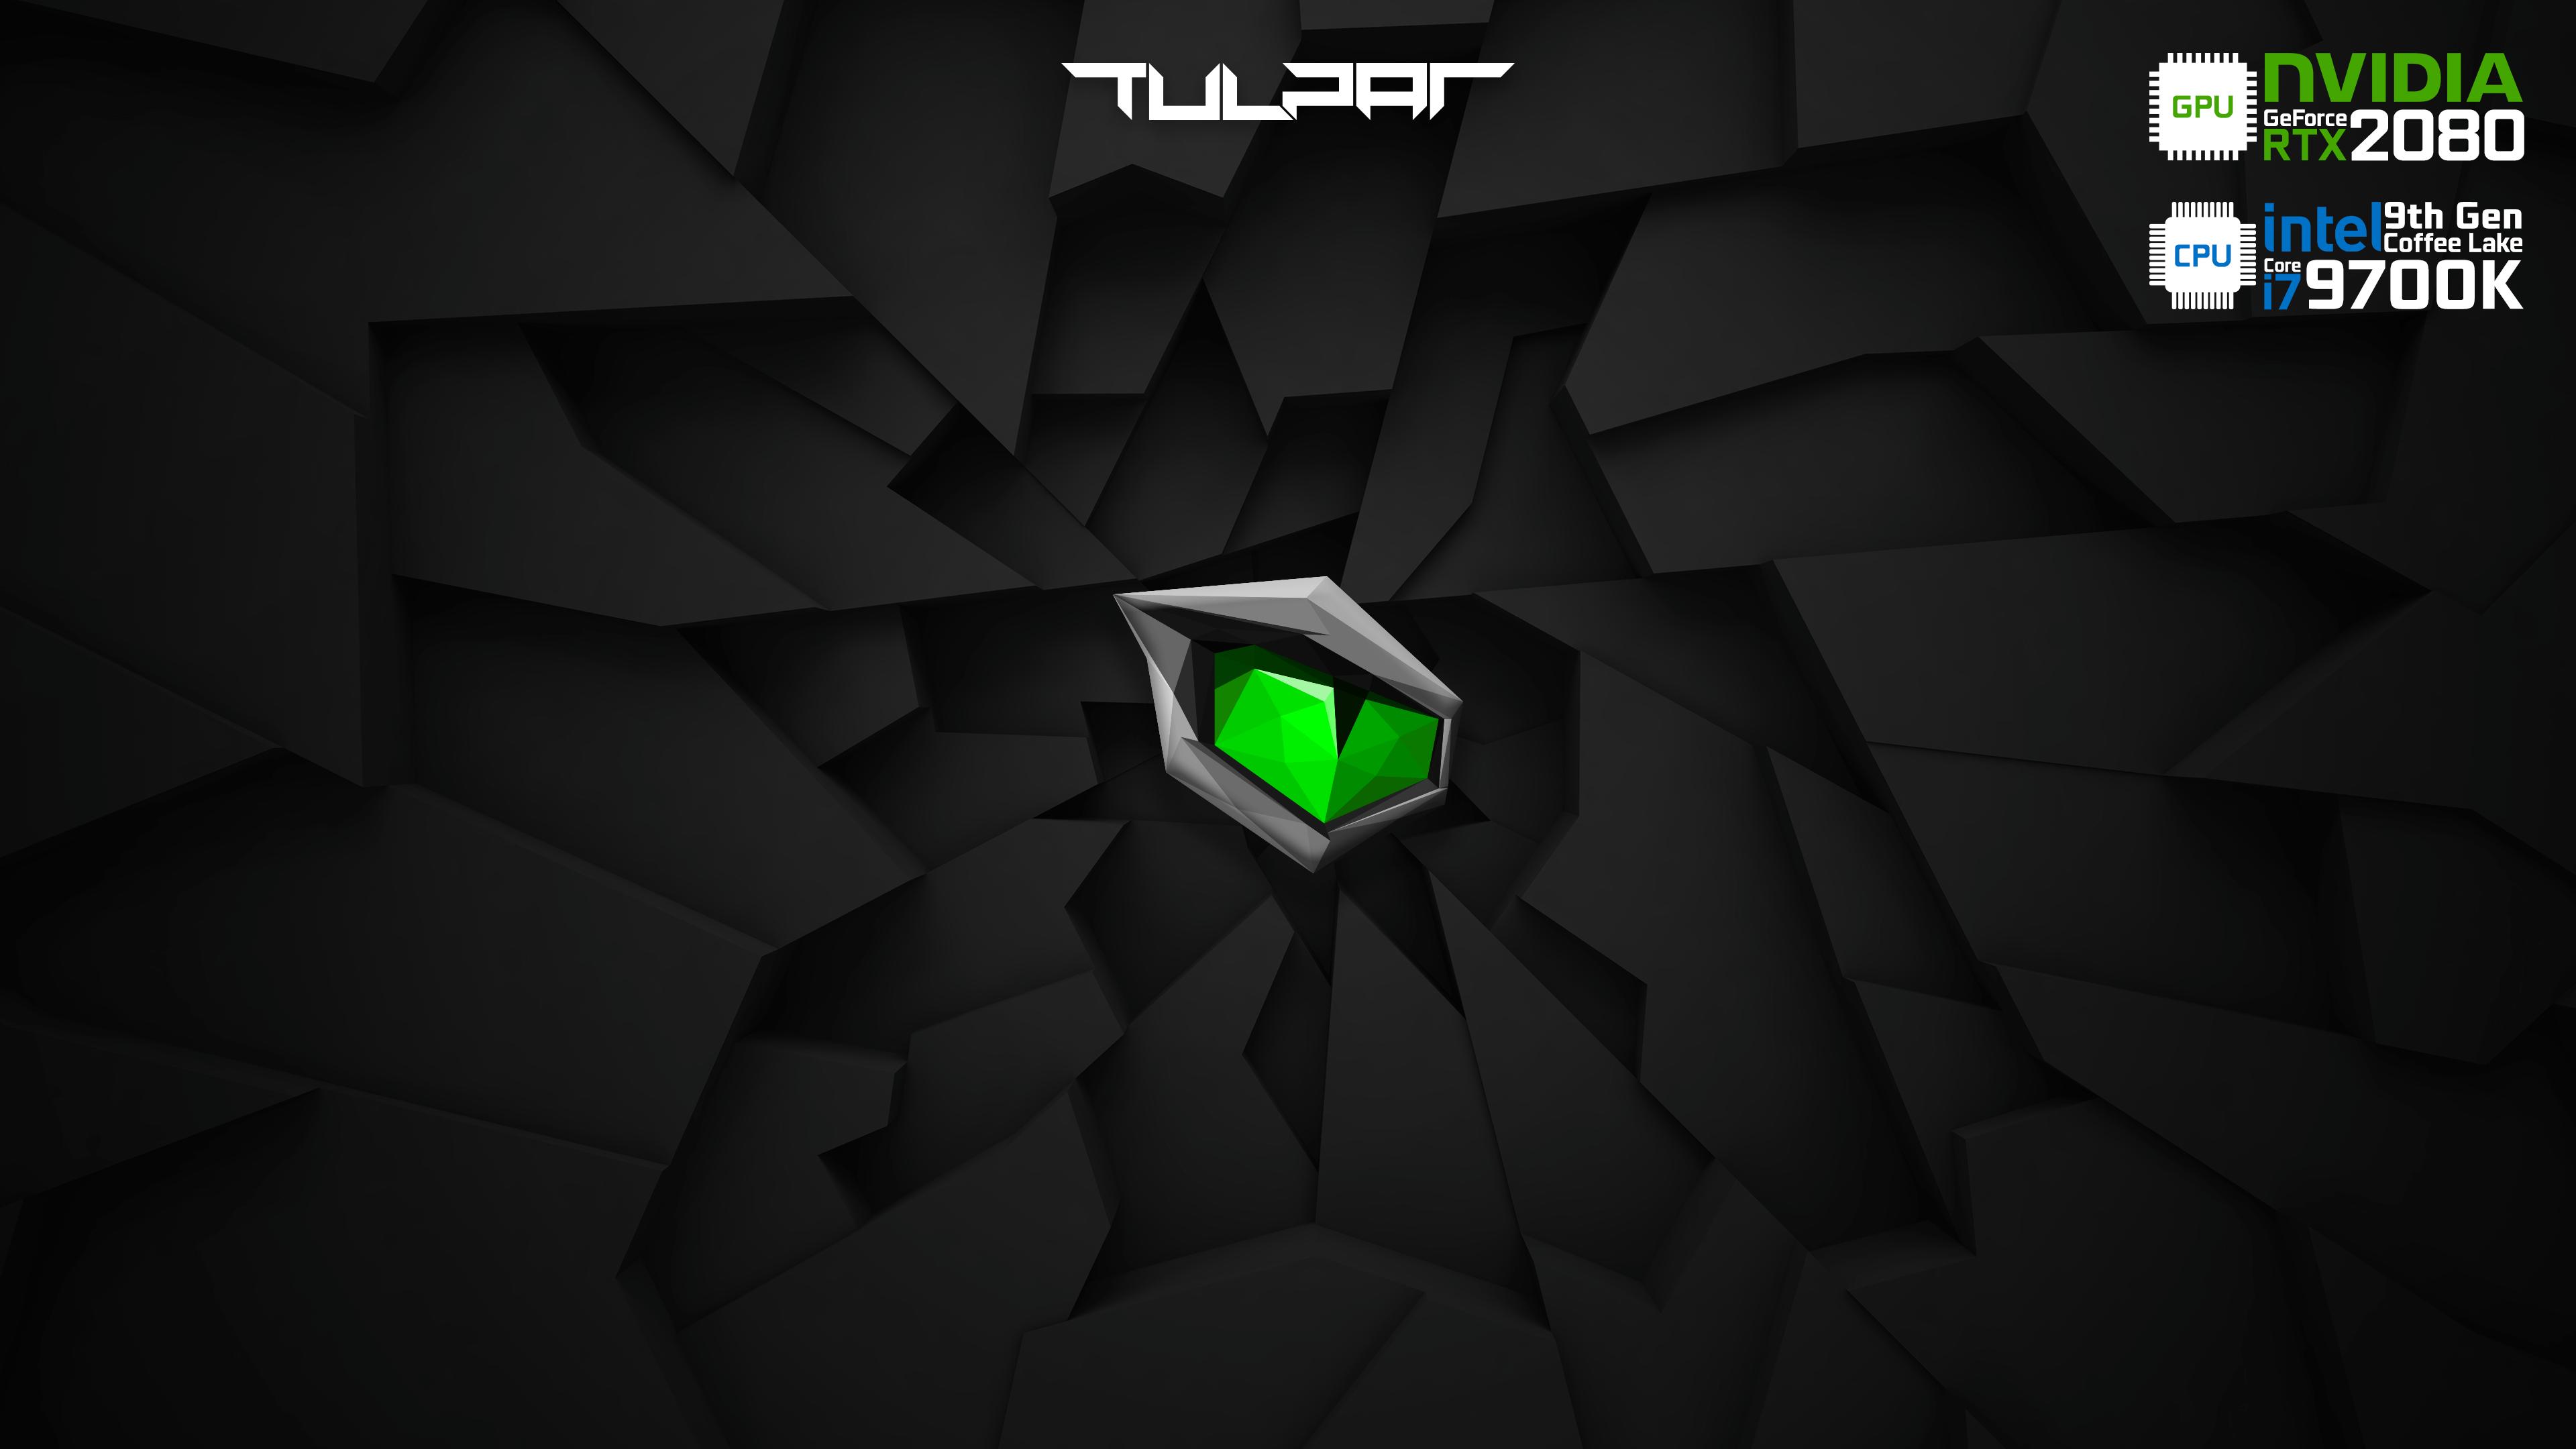 Monster - Tulpar - RTX 2080 - i7 9700K